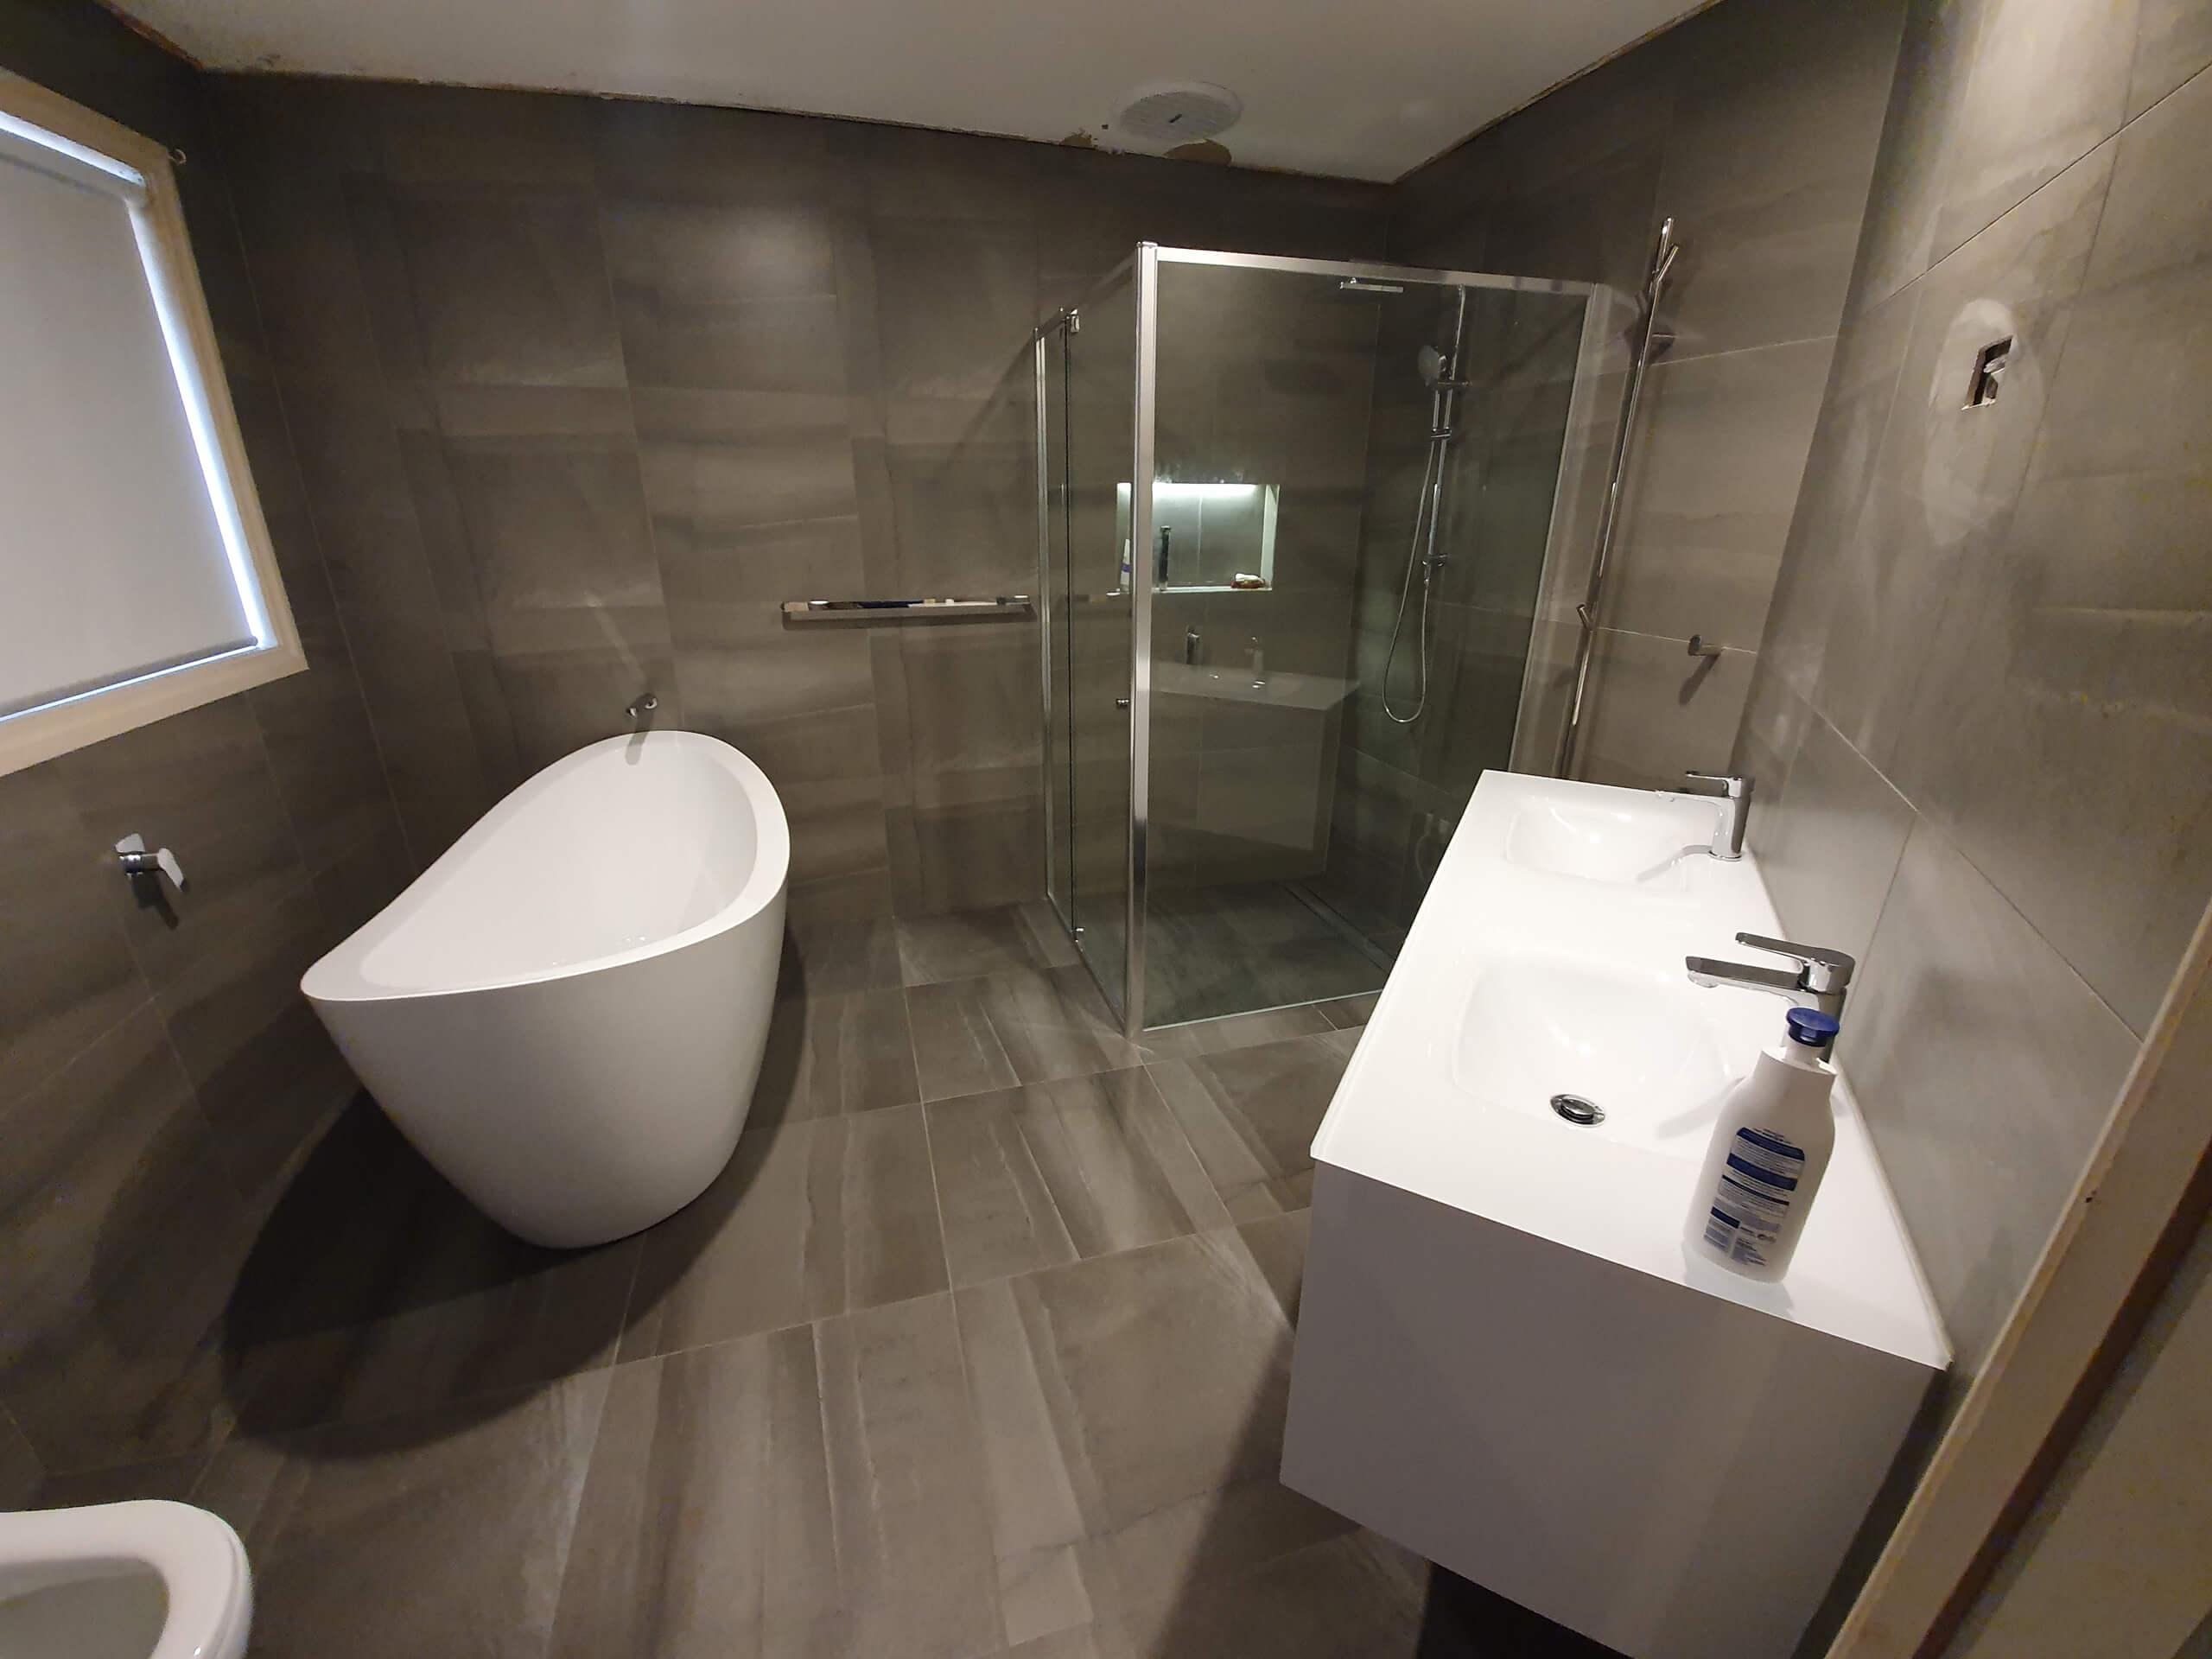 Bathroom tiled 600 x 600 Porcelian tile Lapparto grey look